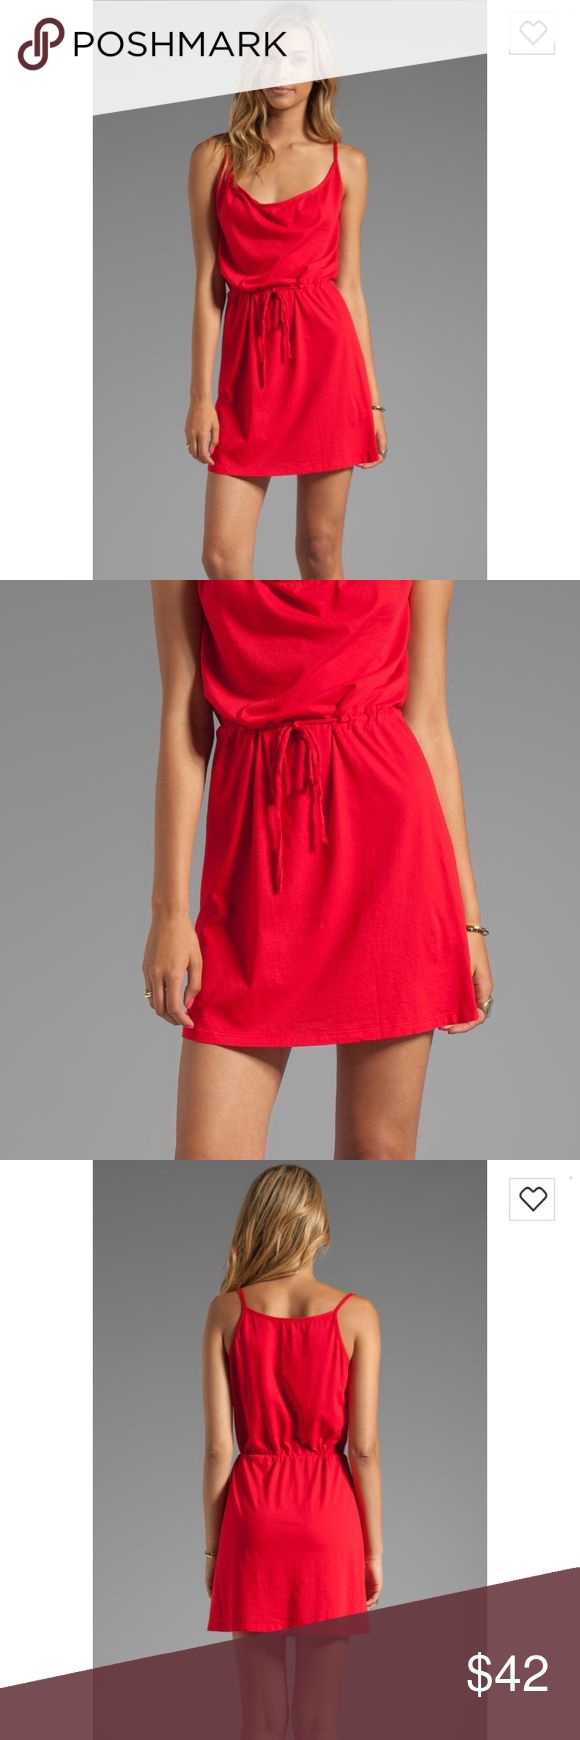 "Bobi Supreme Jersey Tie Waist Dress in ""Bali"" Vibrant red tie waist dress. Purchased from Revolve Clothing online. Bobi Dresses"